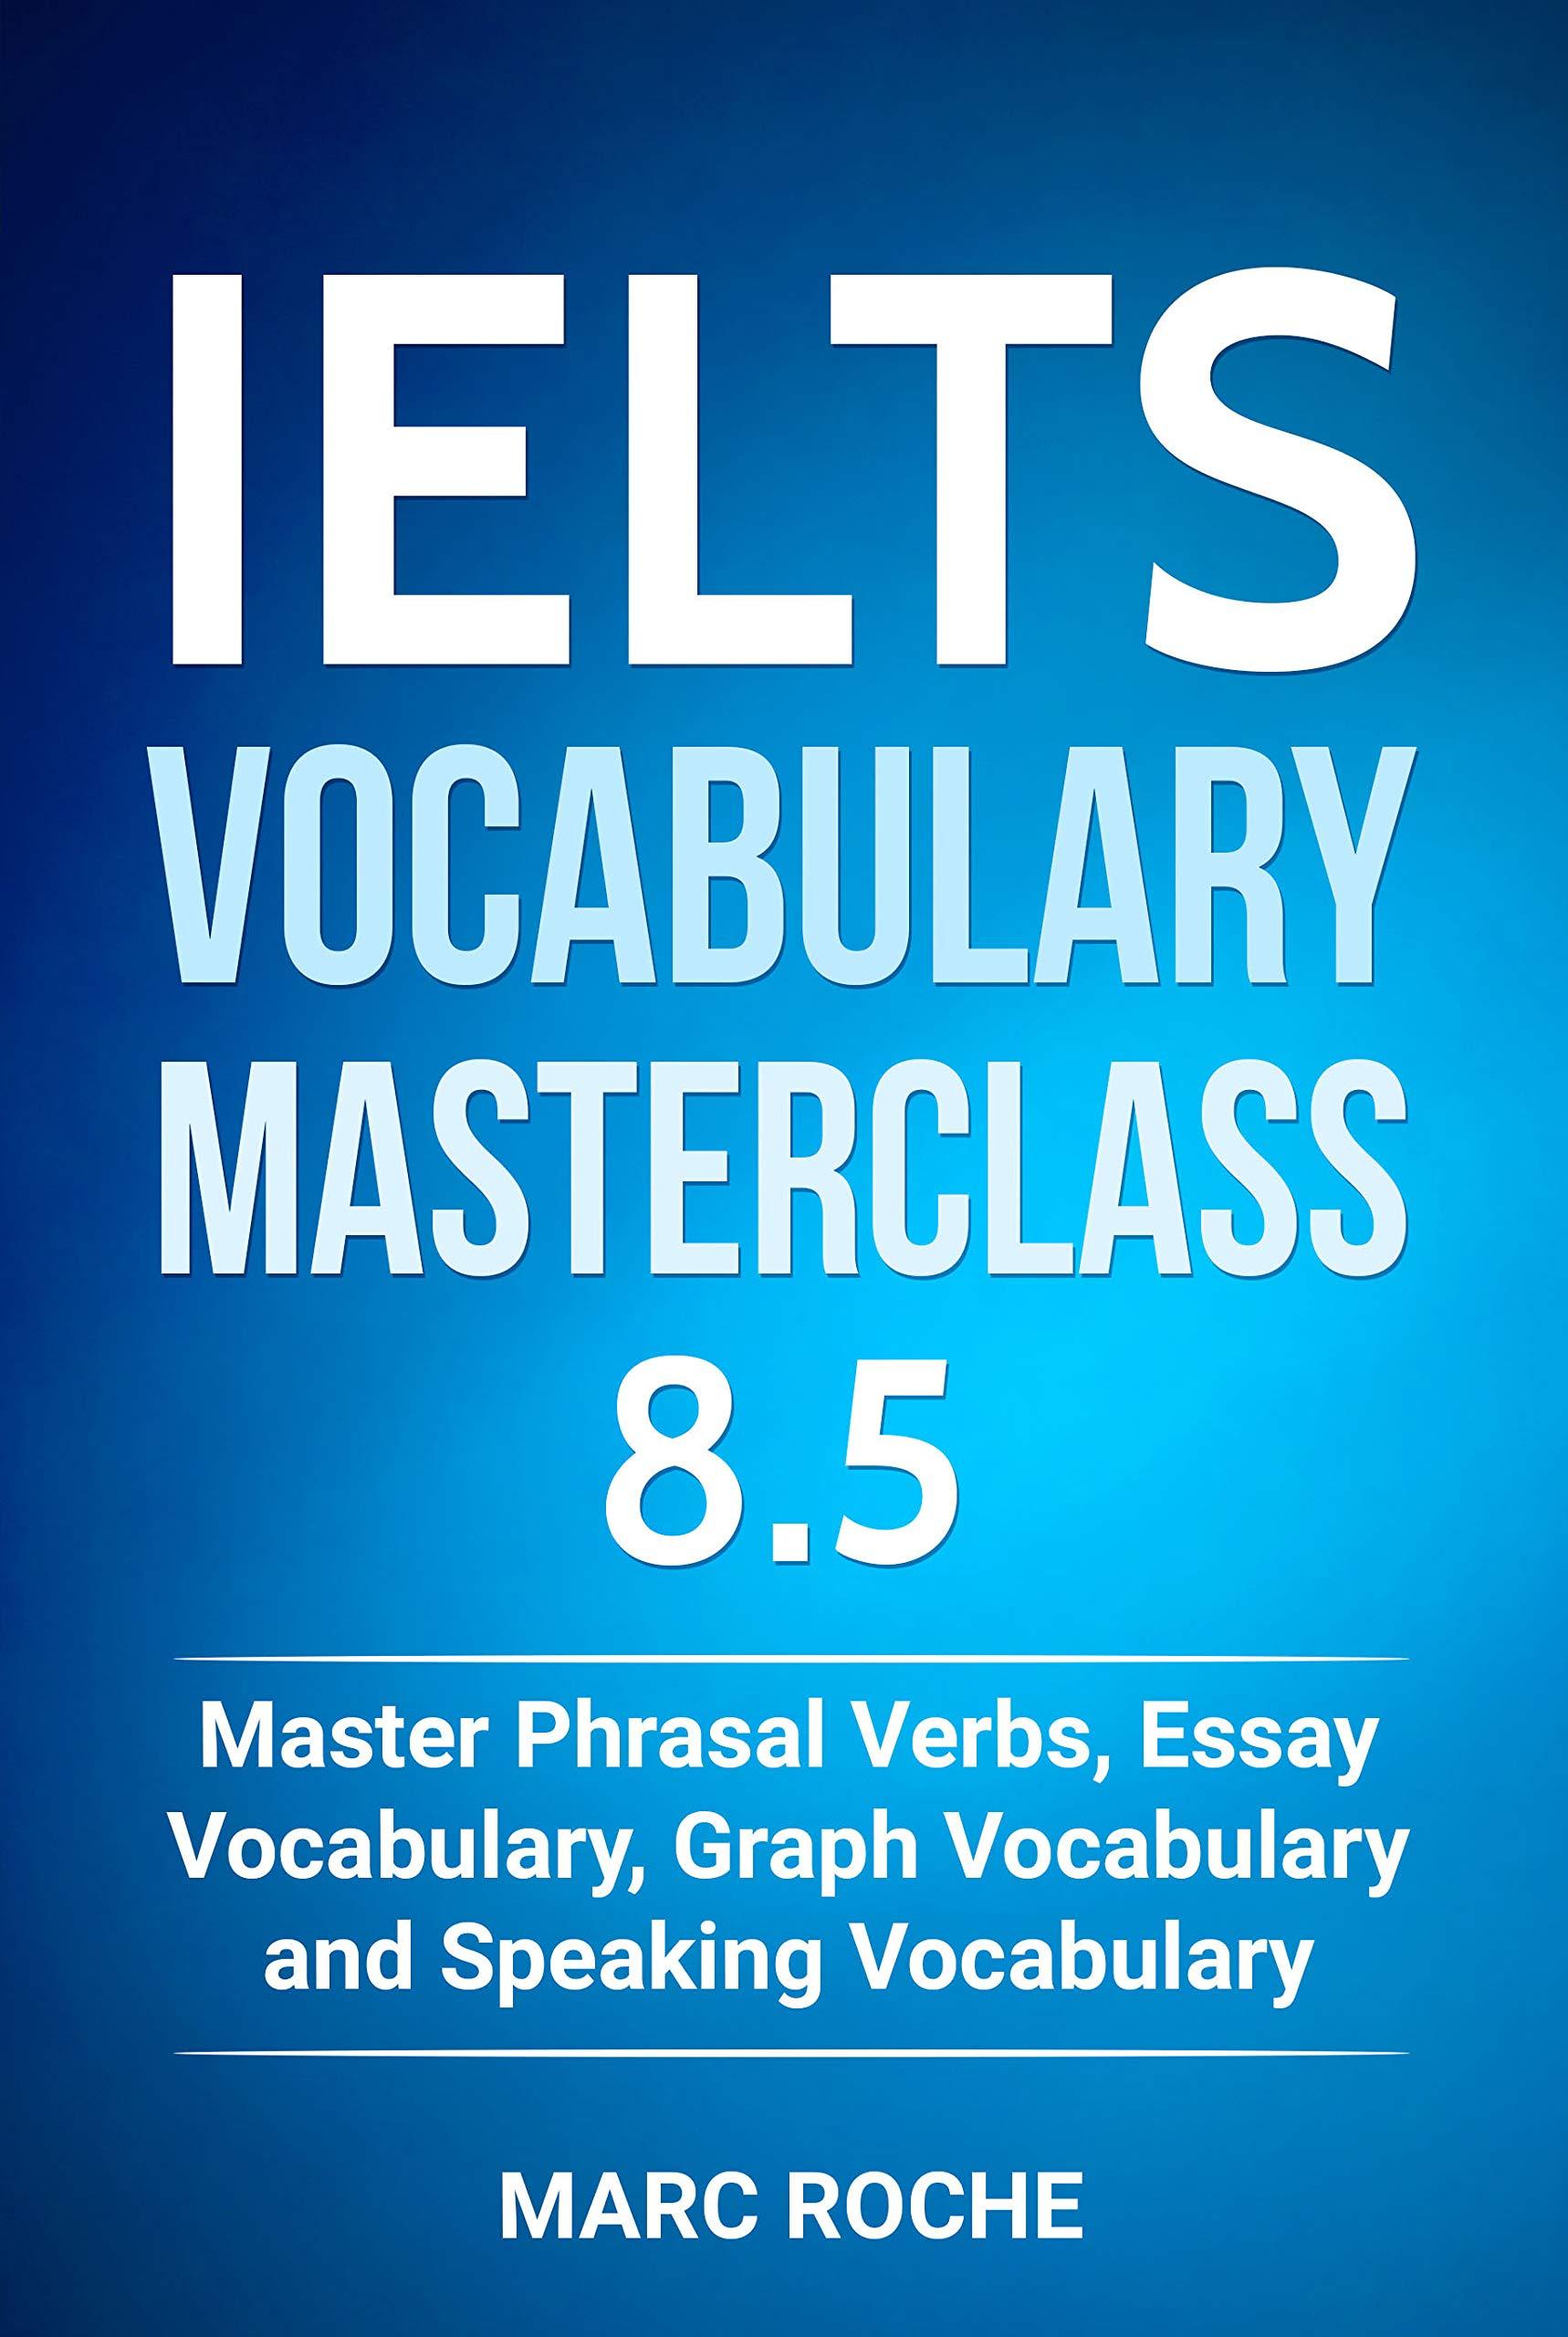 IELTS Vocabulary Masterclass 8.5. Master Phrasal Verbs Essay Vocabulary Graph Vocabulary And Speaking Vocabulary  IELTS Vocabulary Book Book 1   English Edition